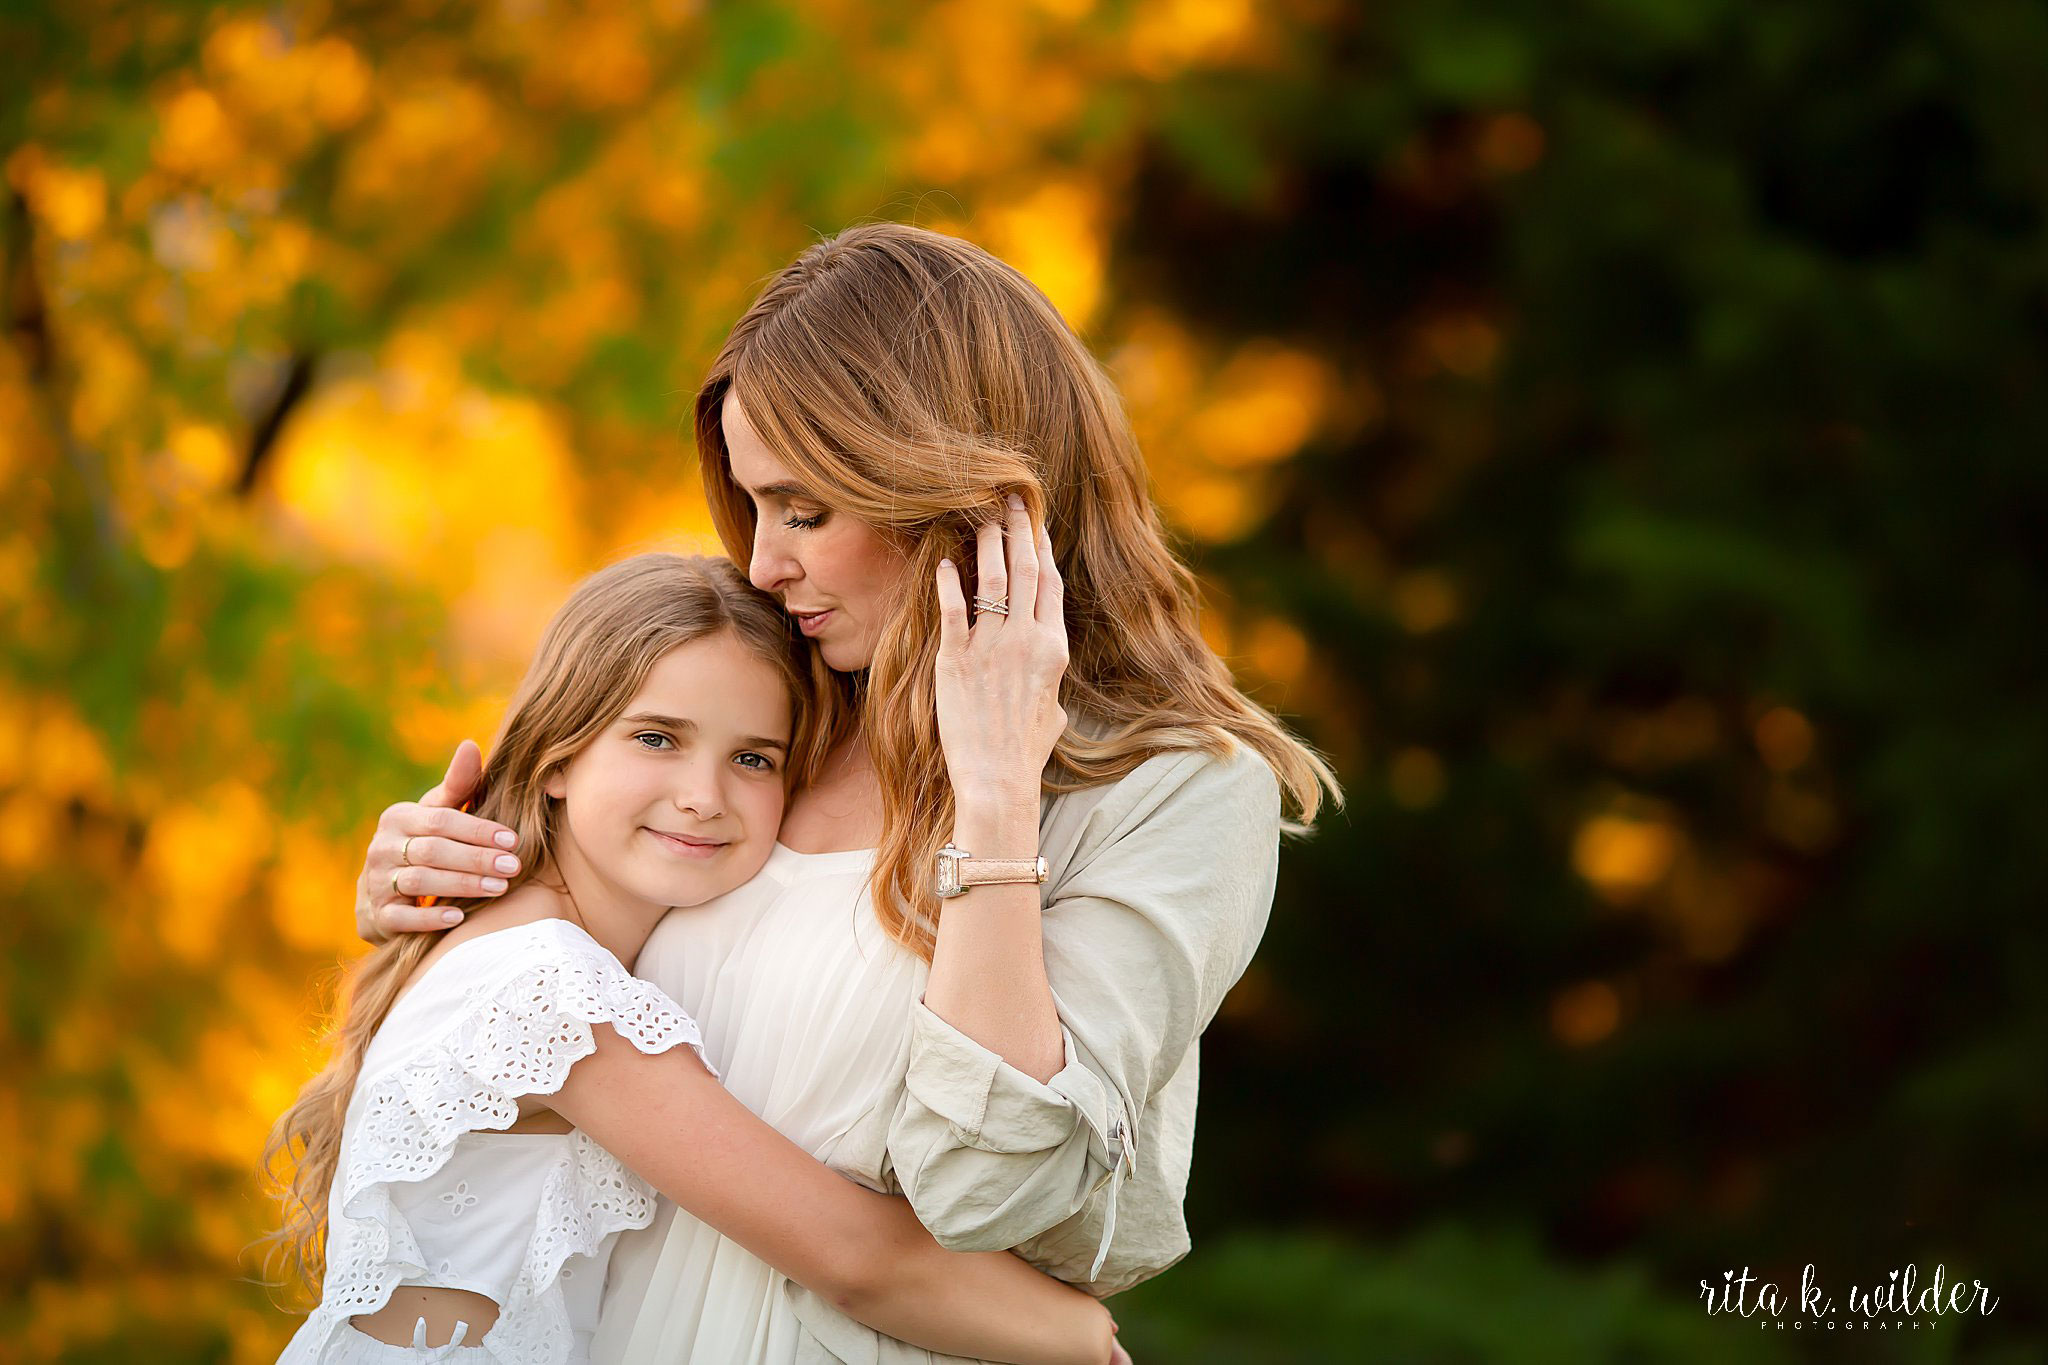 Best Dallas Family Photographer